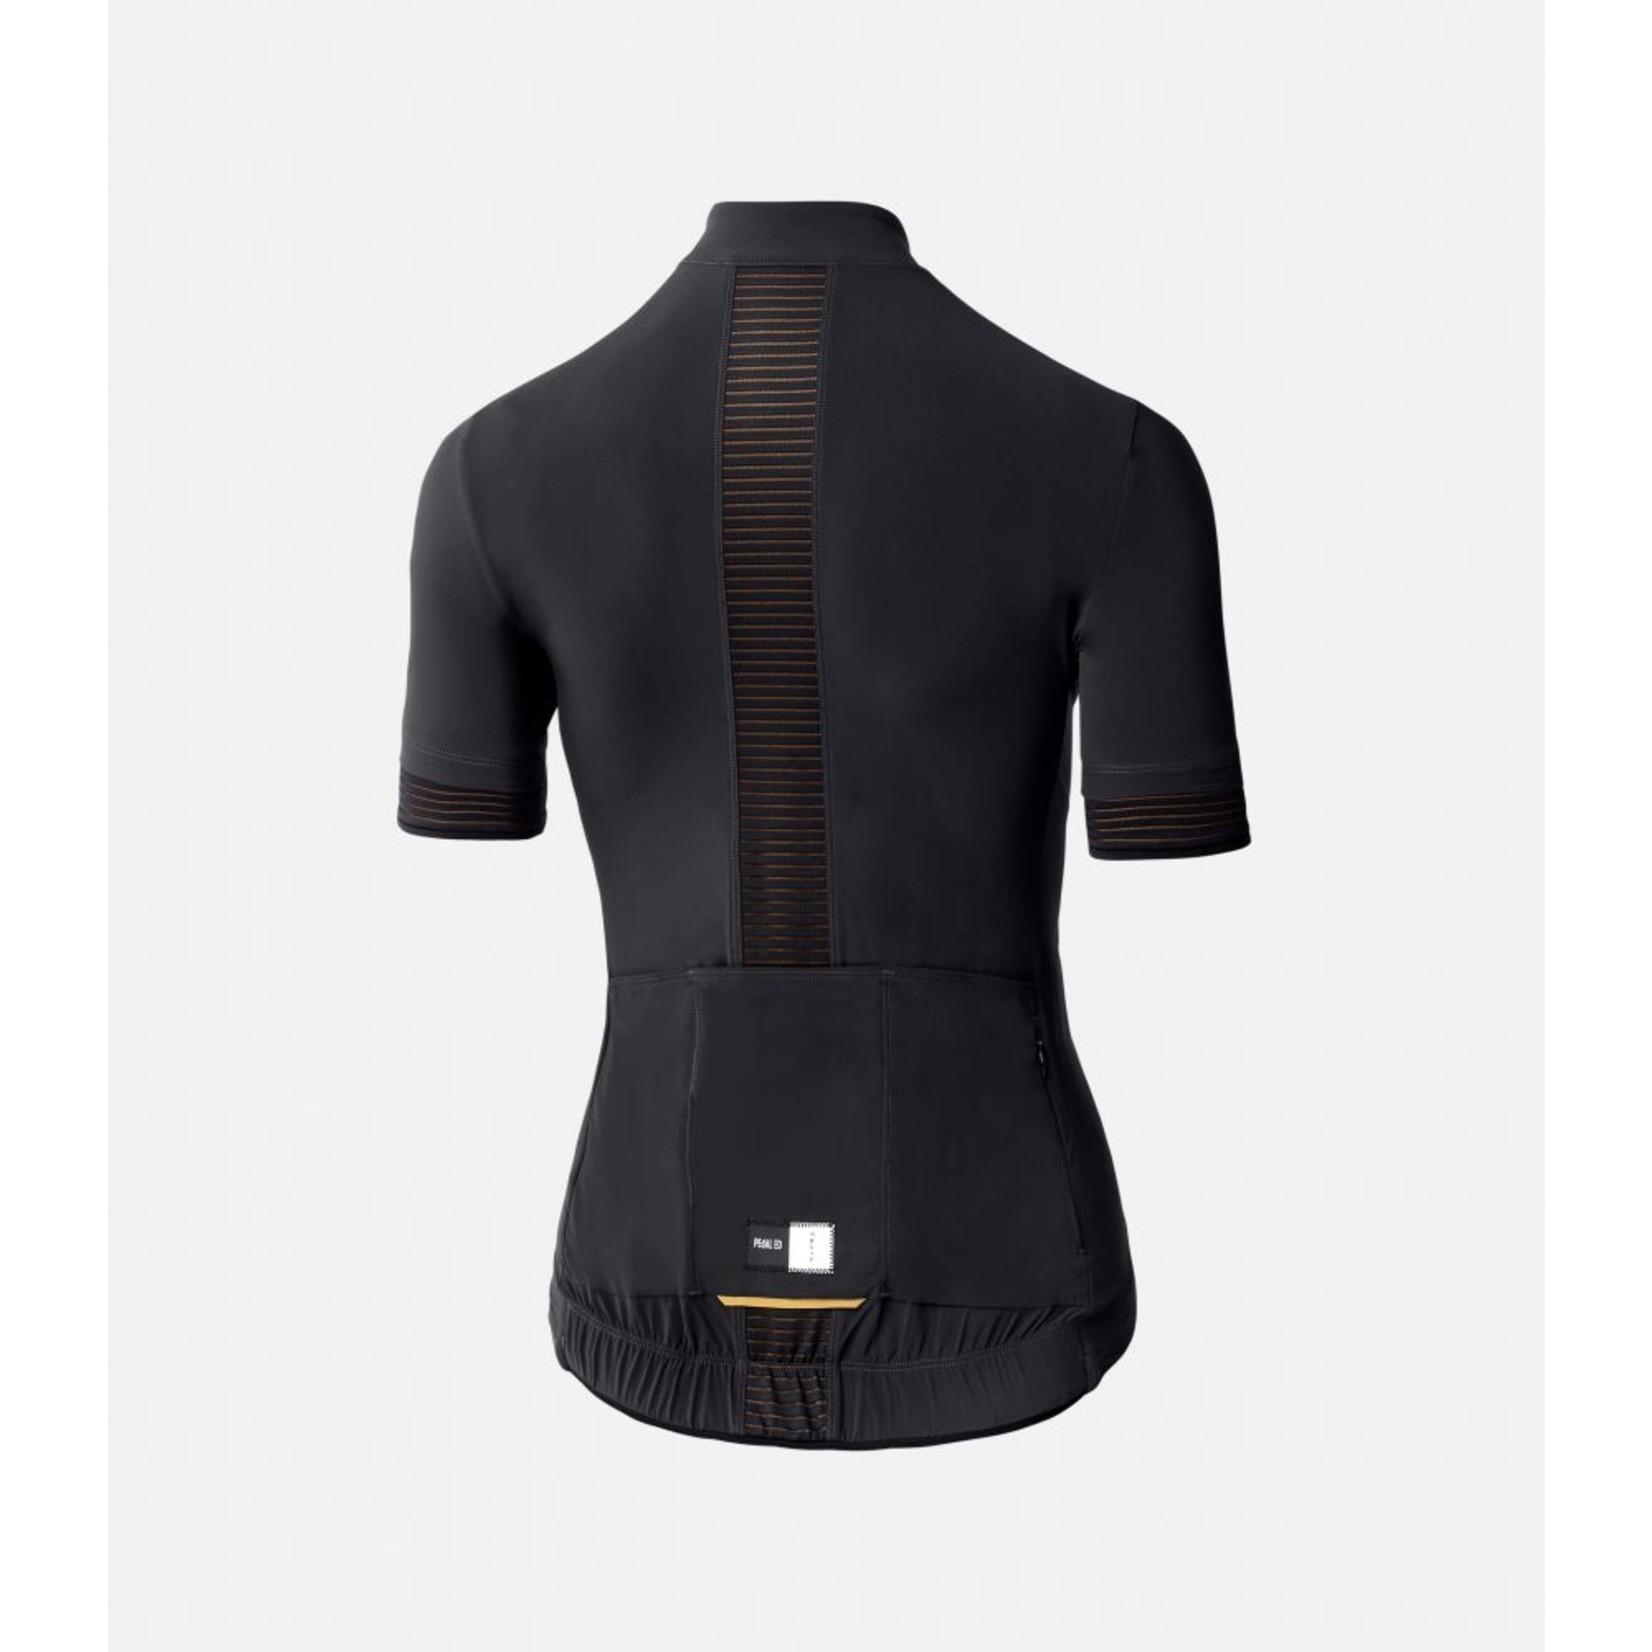 PEdALED PEdALED Women hane lightweight Jersey L black